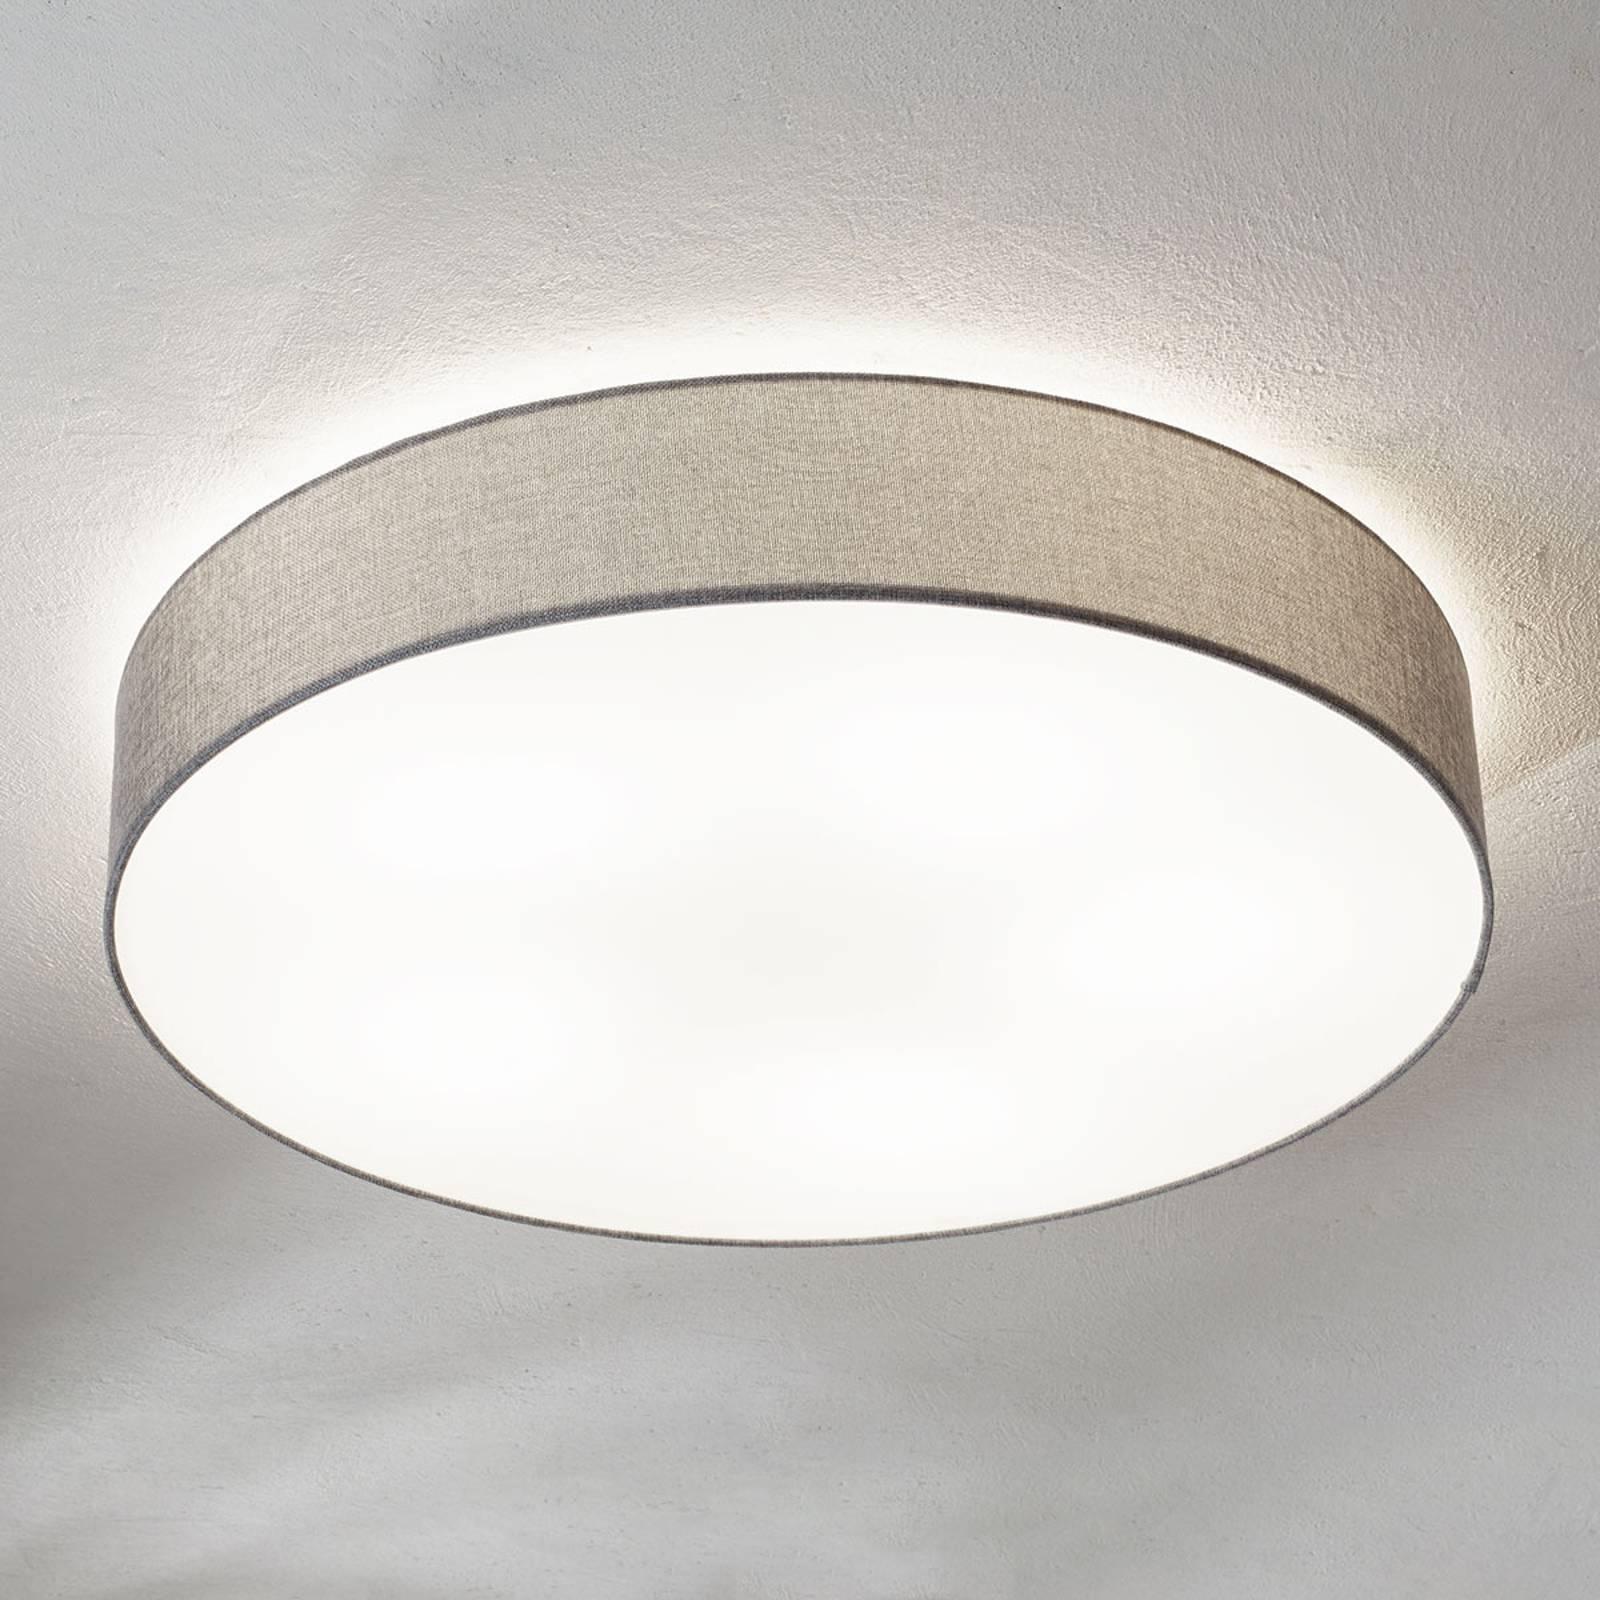 Grijze plafondlamp Pasteri met linnen kap 76 cm